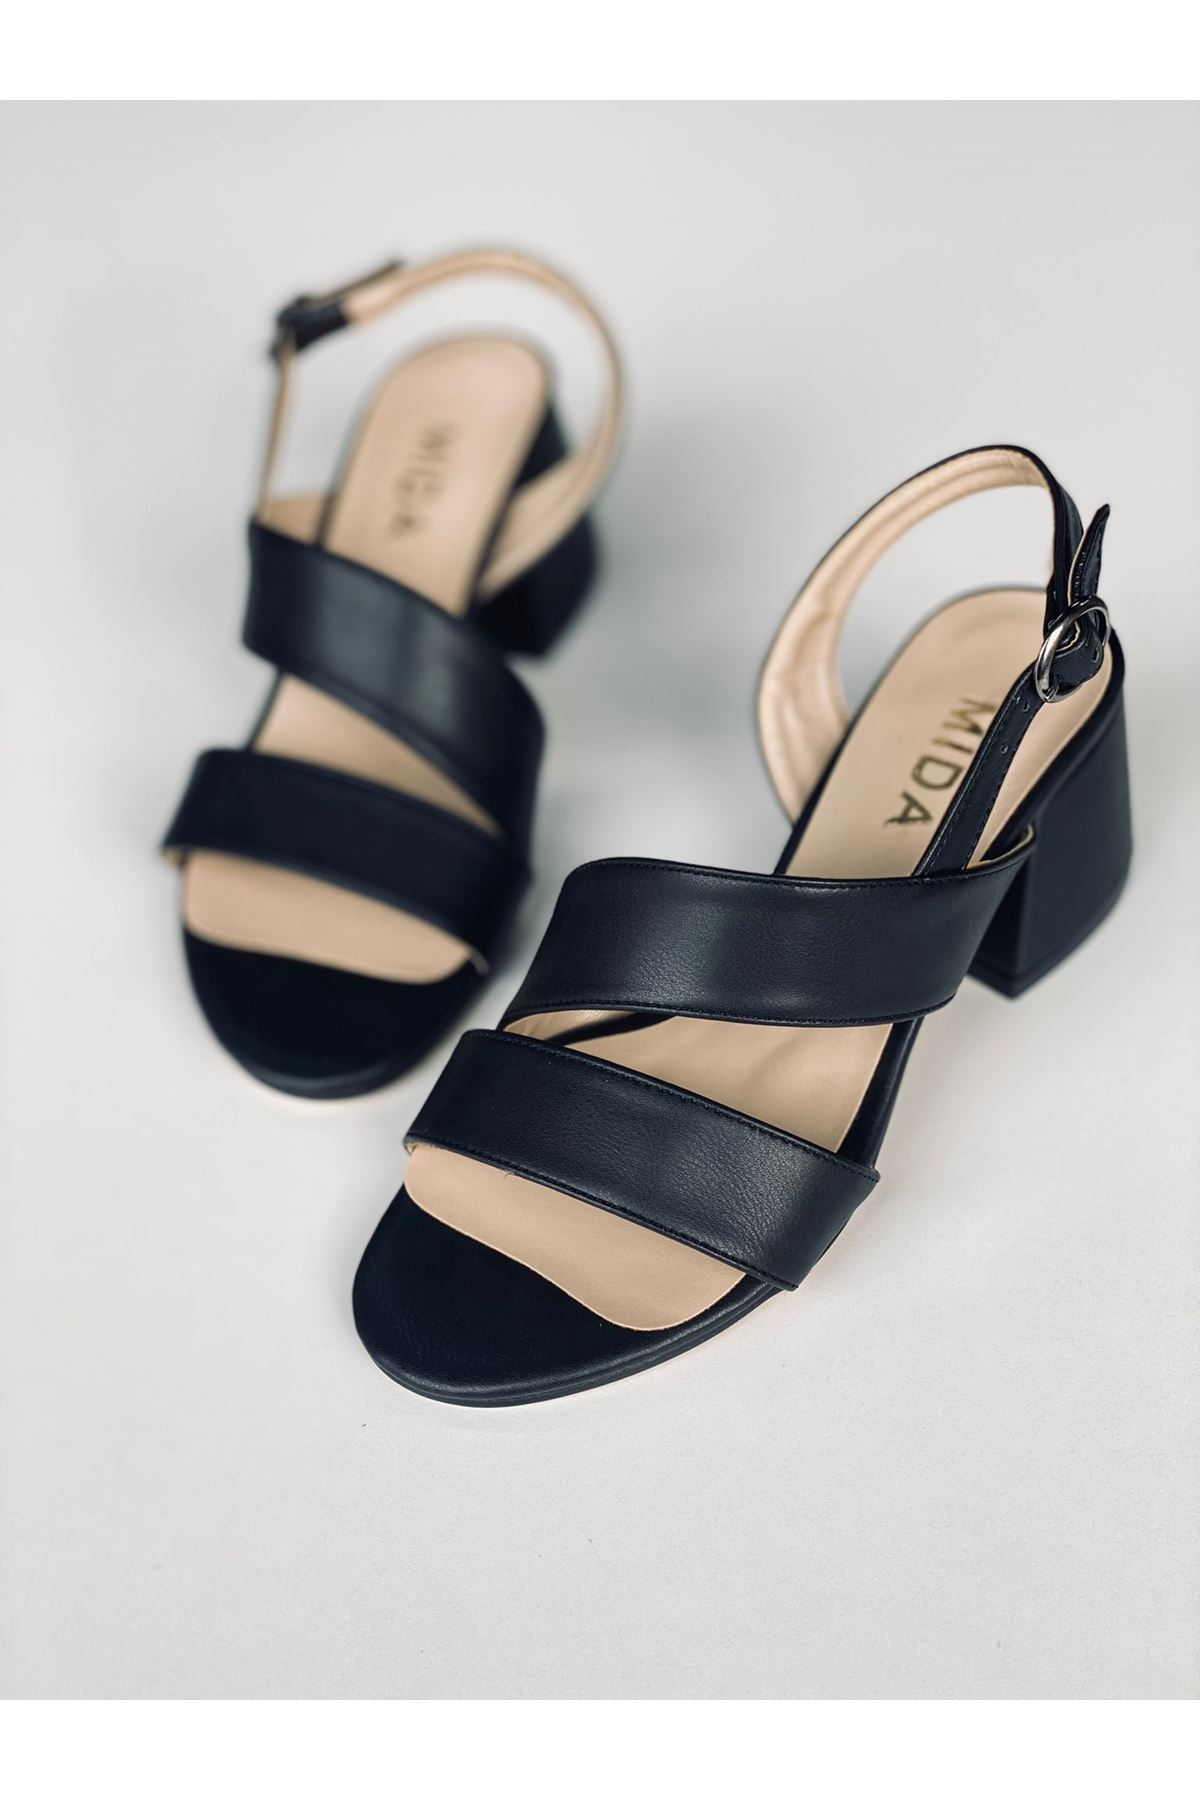 Y502 Siyah Deri Topuklu Ayakkabı